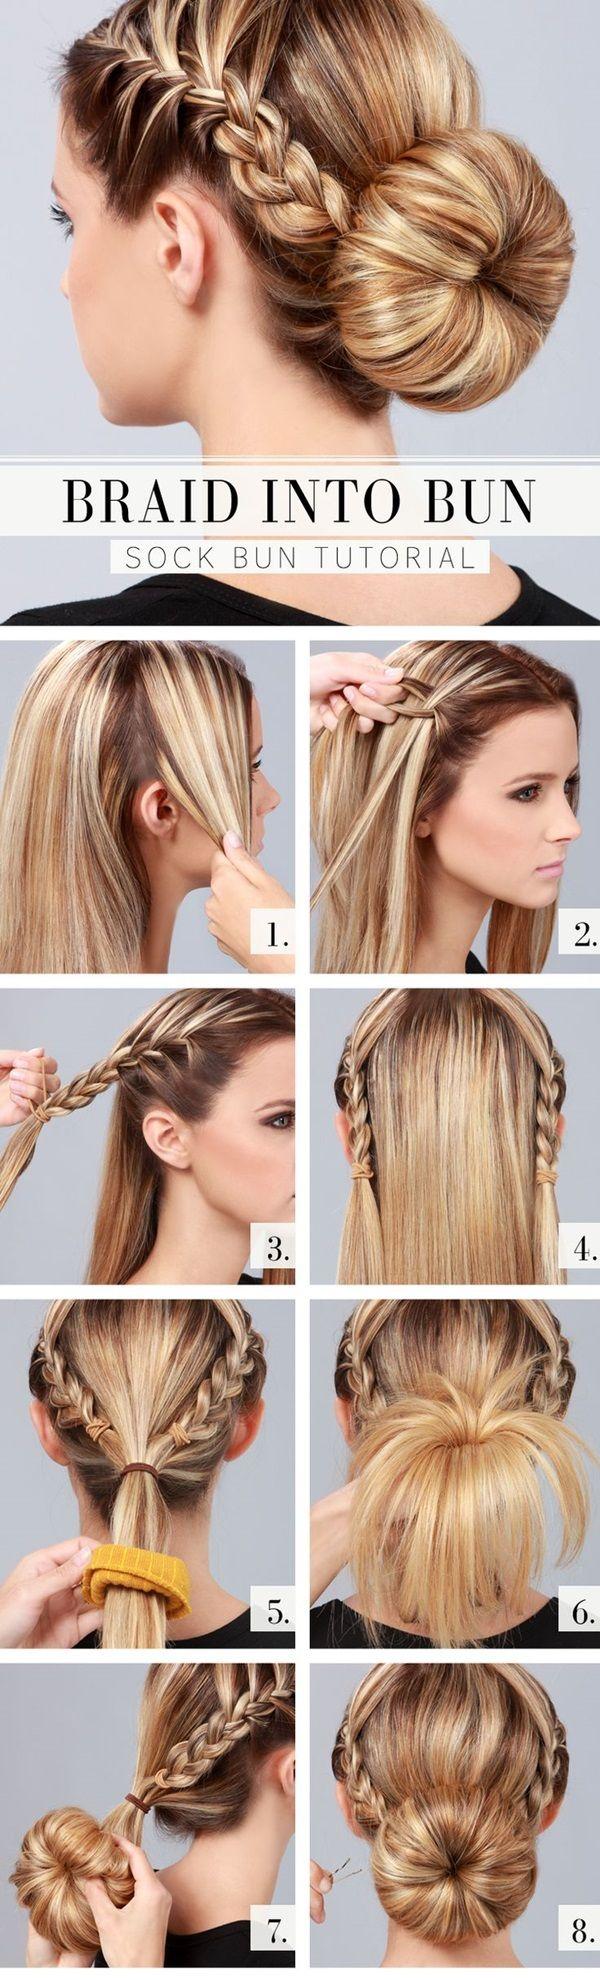 Peachy 1000 Ideas About Diy Hairstyles On Pinterest Easy Diy Short Hairstyles For Black Women Fulllsitofus